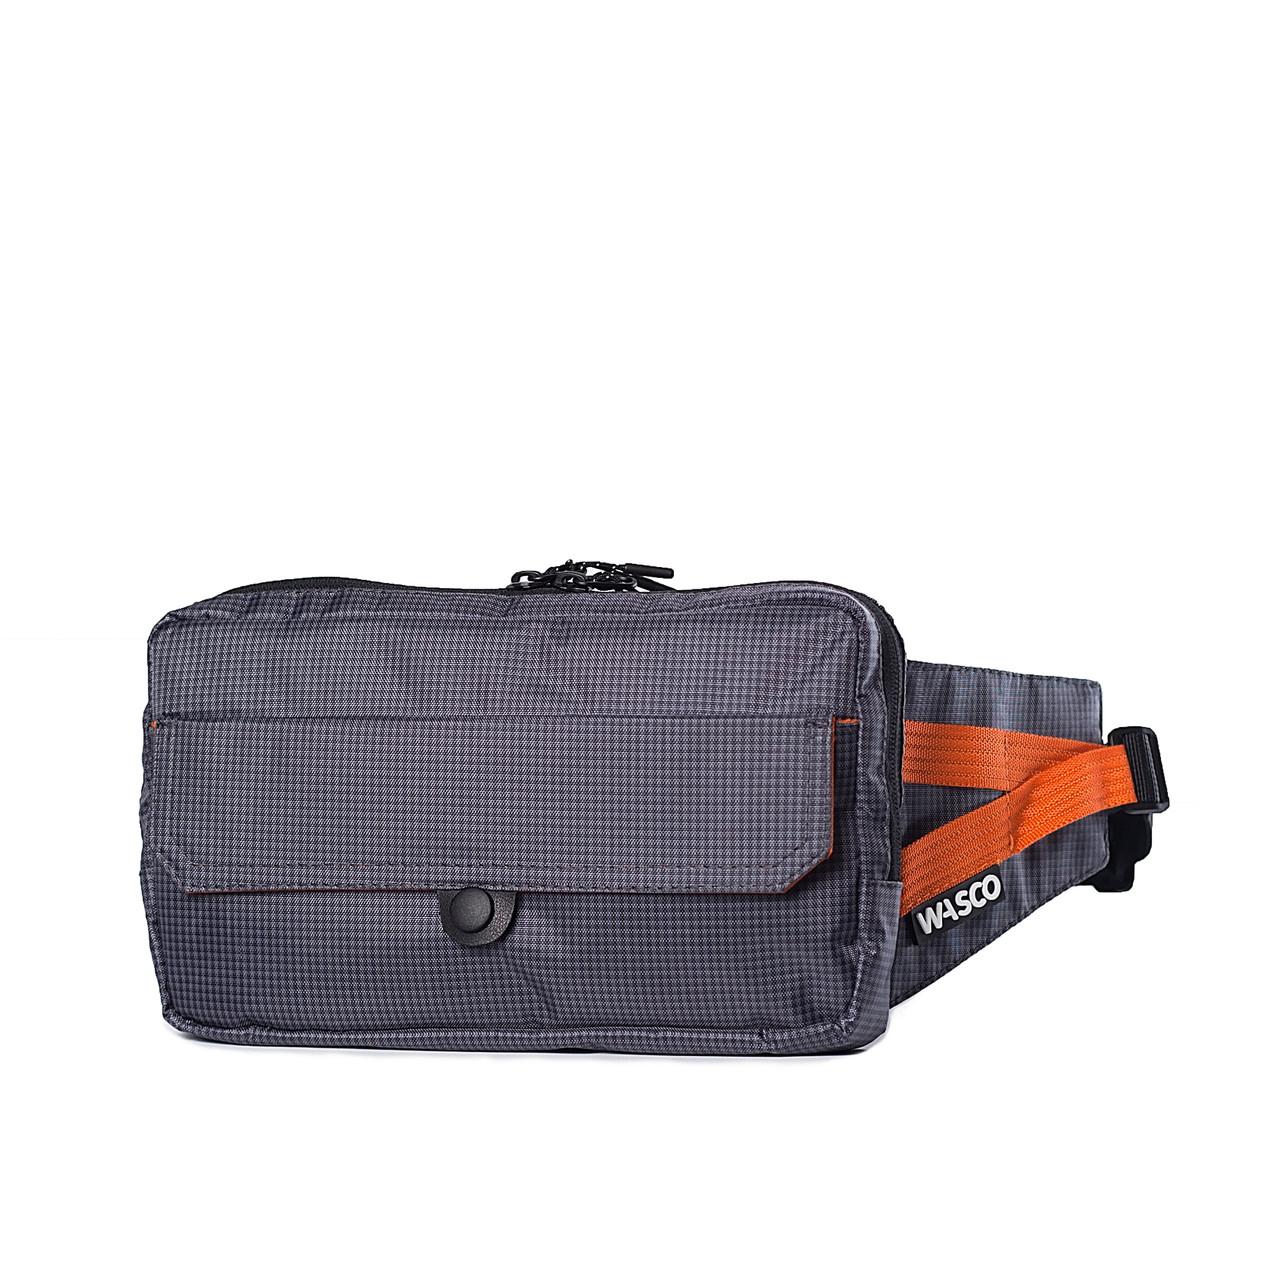 Поясная сумка Wasco G1 Серая-Оранж